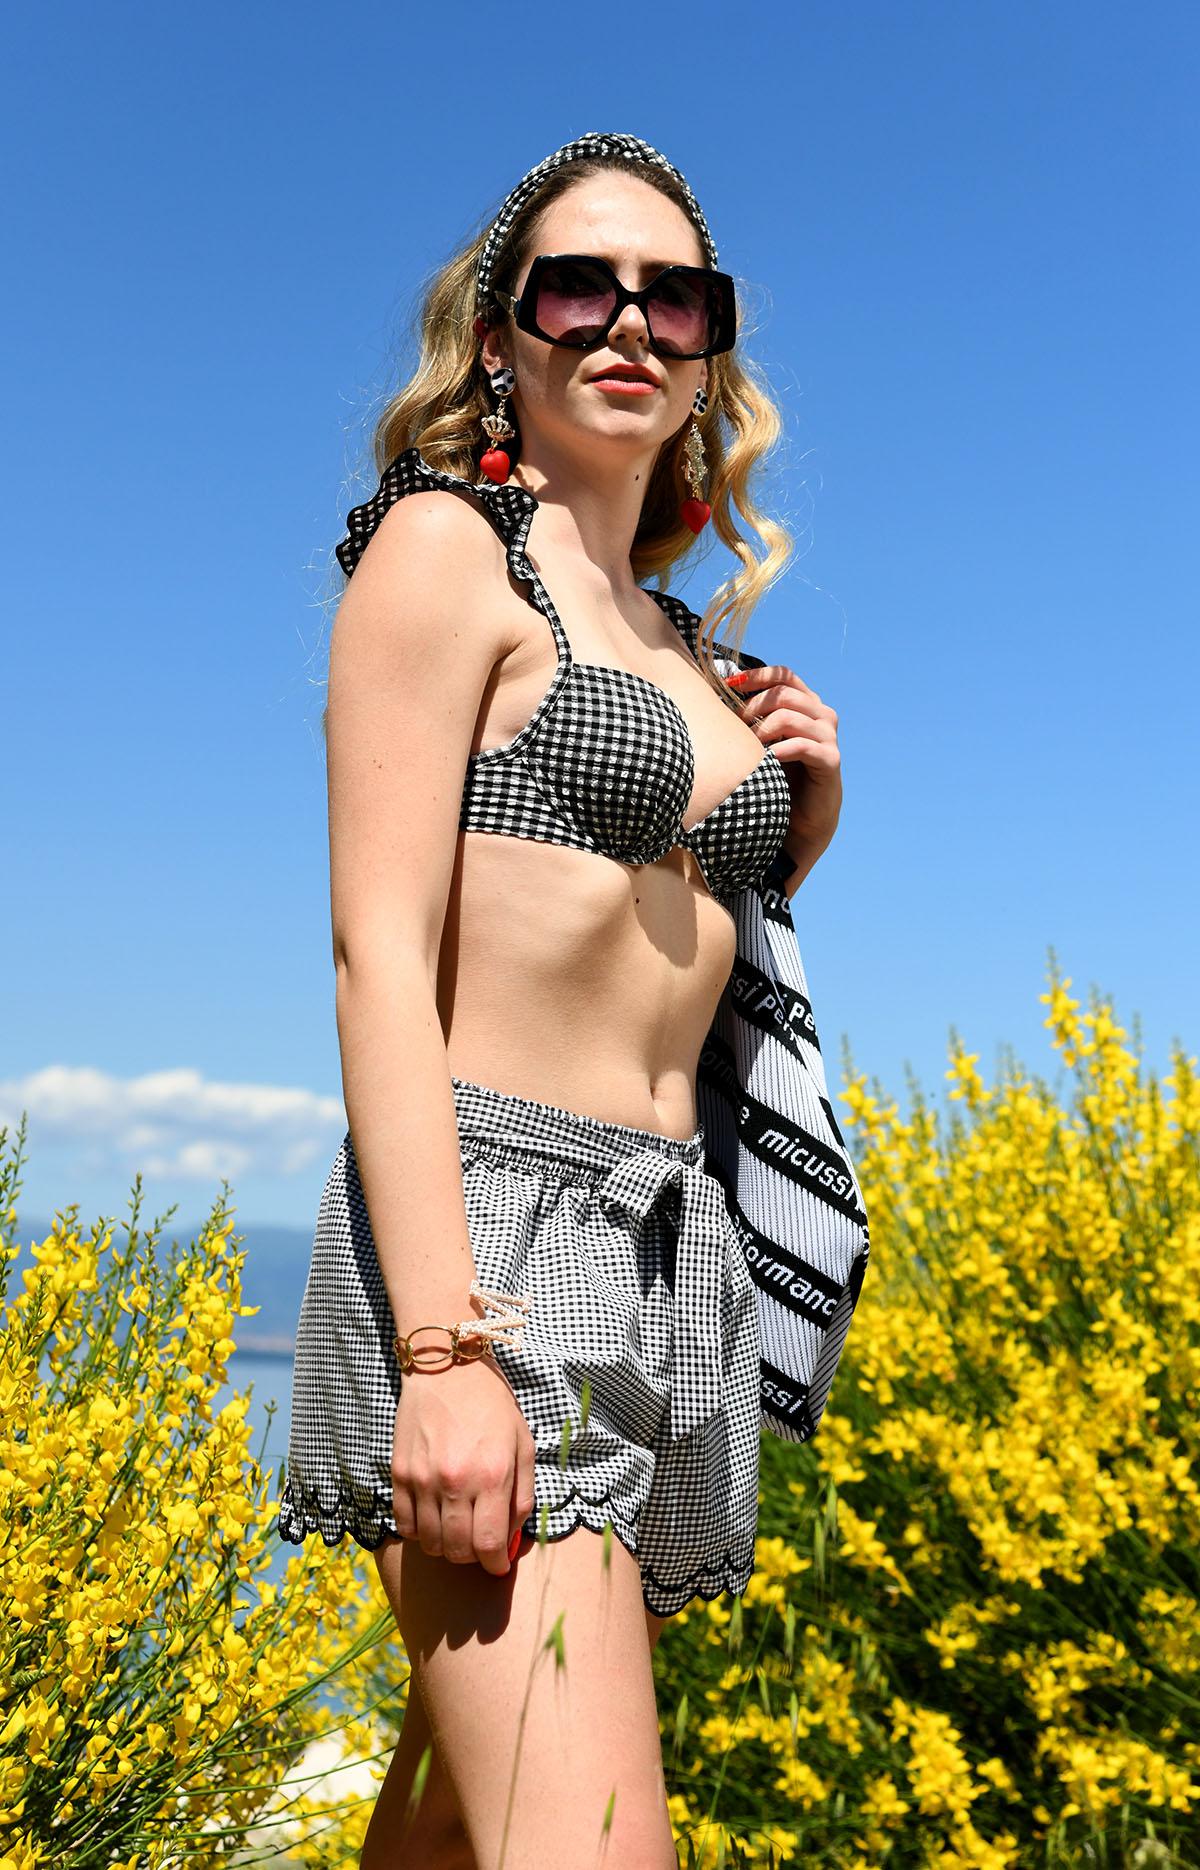 Extravagant editorijal: Summer in Style